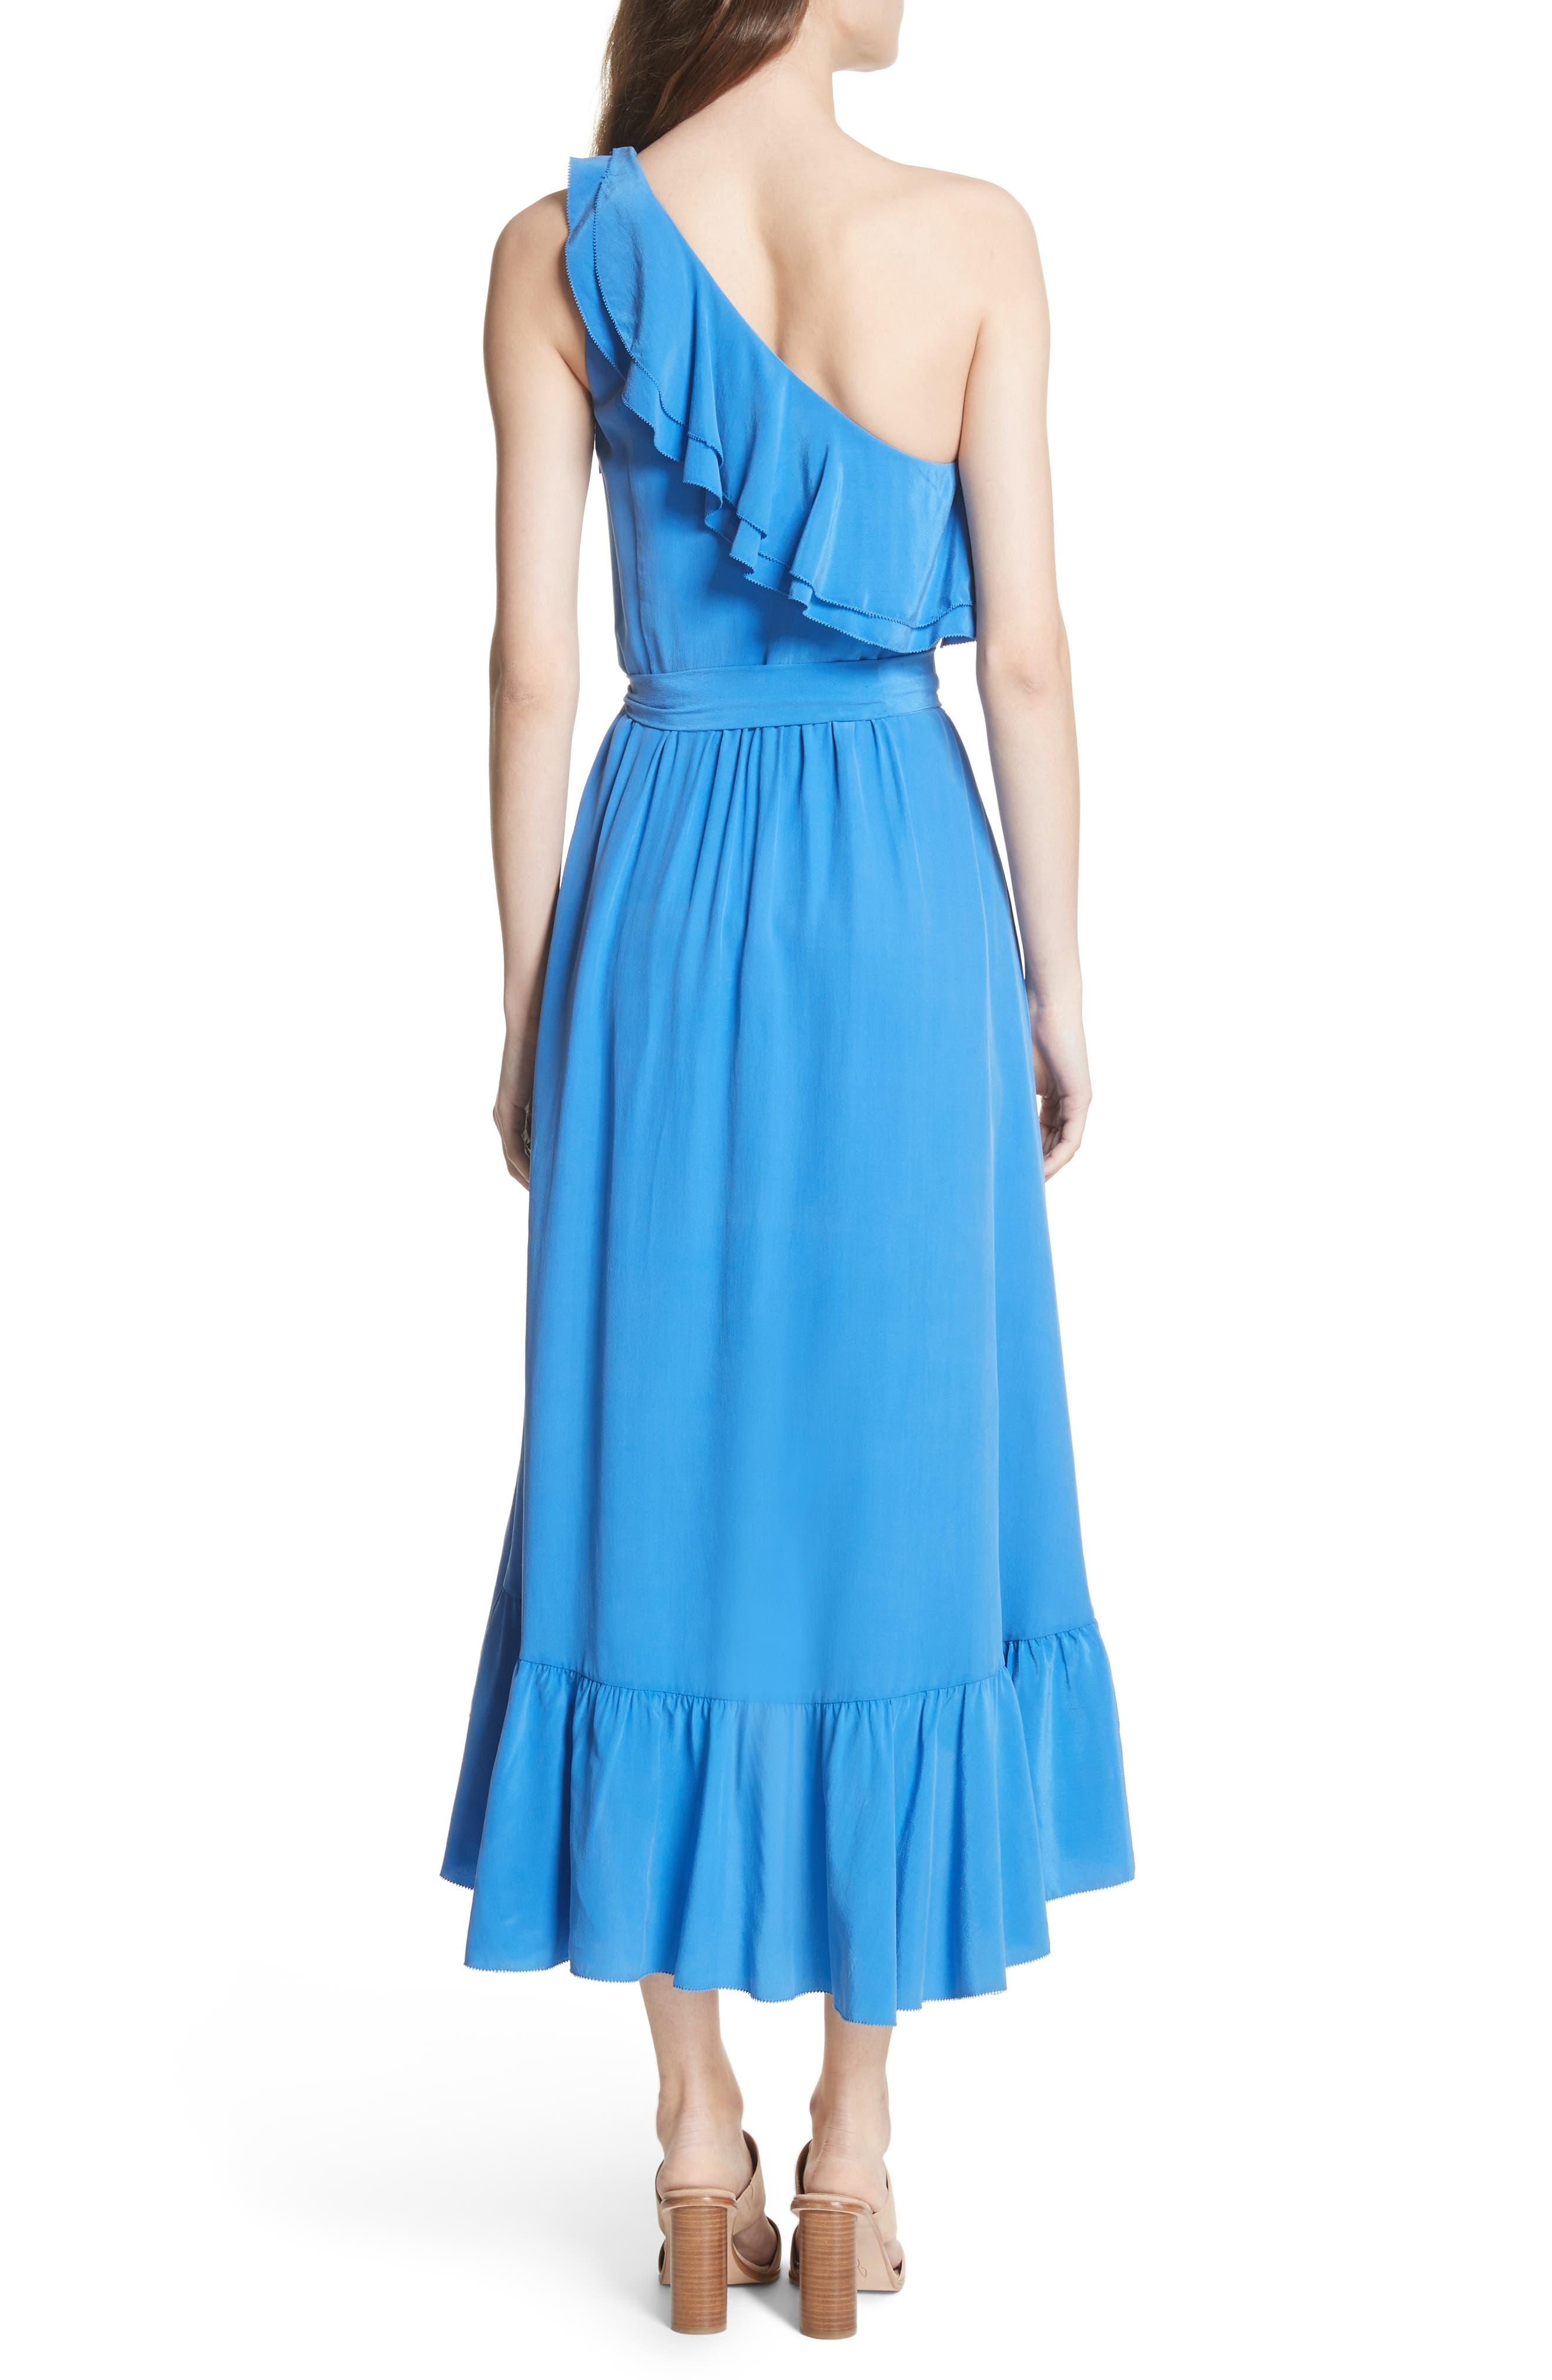 Damica Ruffle One-Shoulder Silk Dress,                             Alternate thumbnail 2, color,                             420